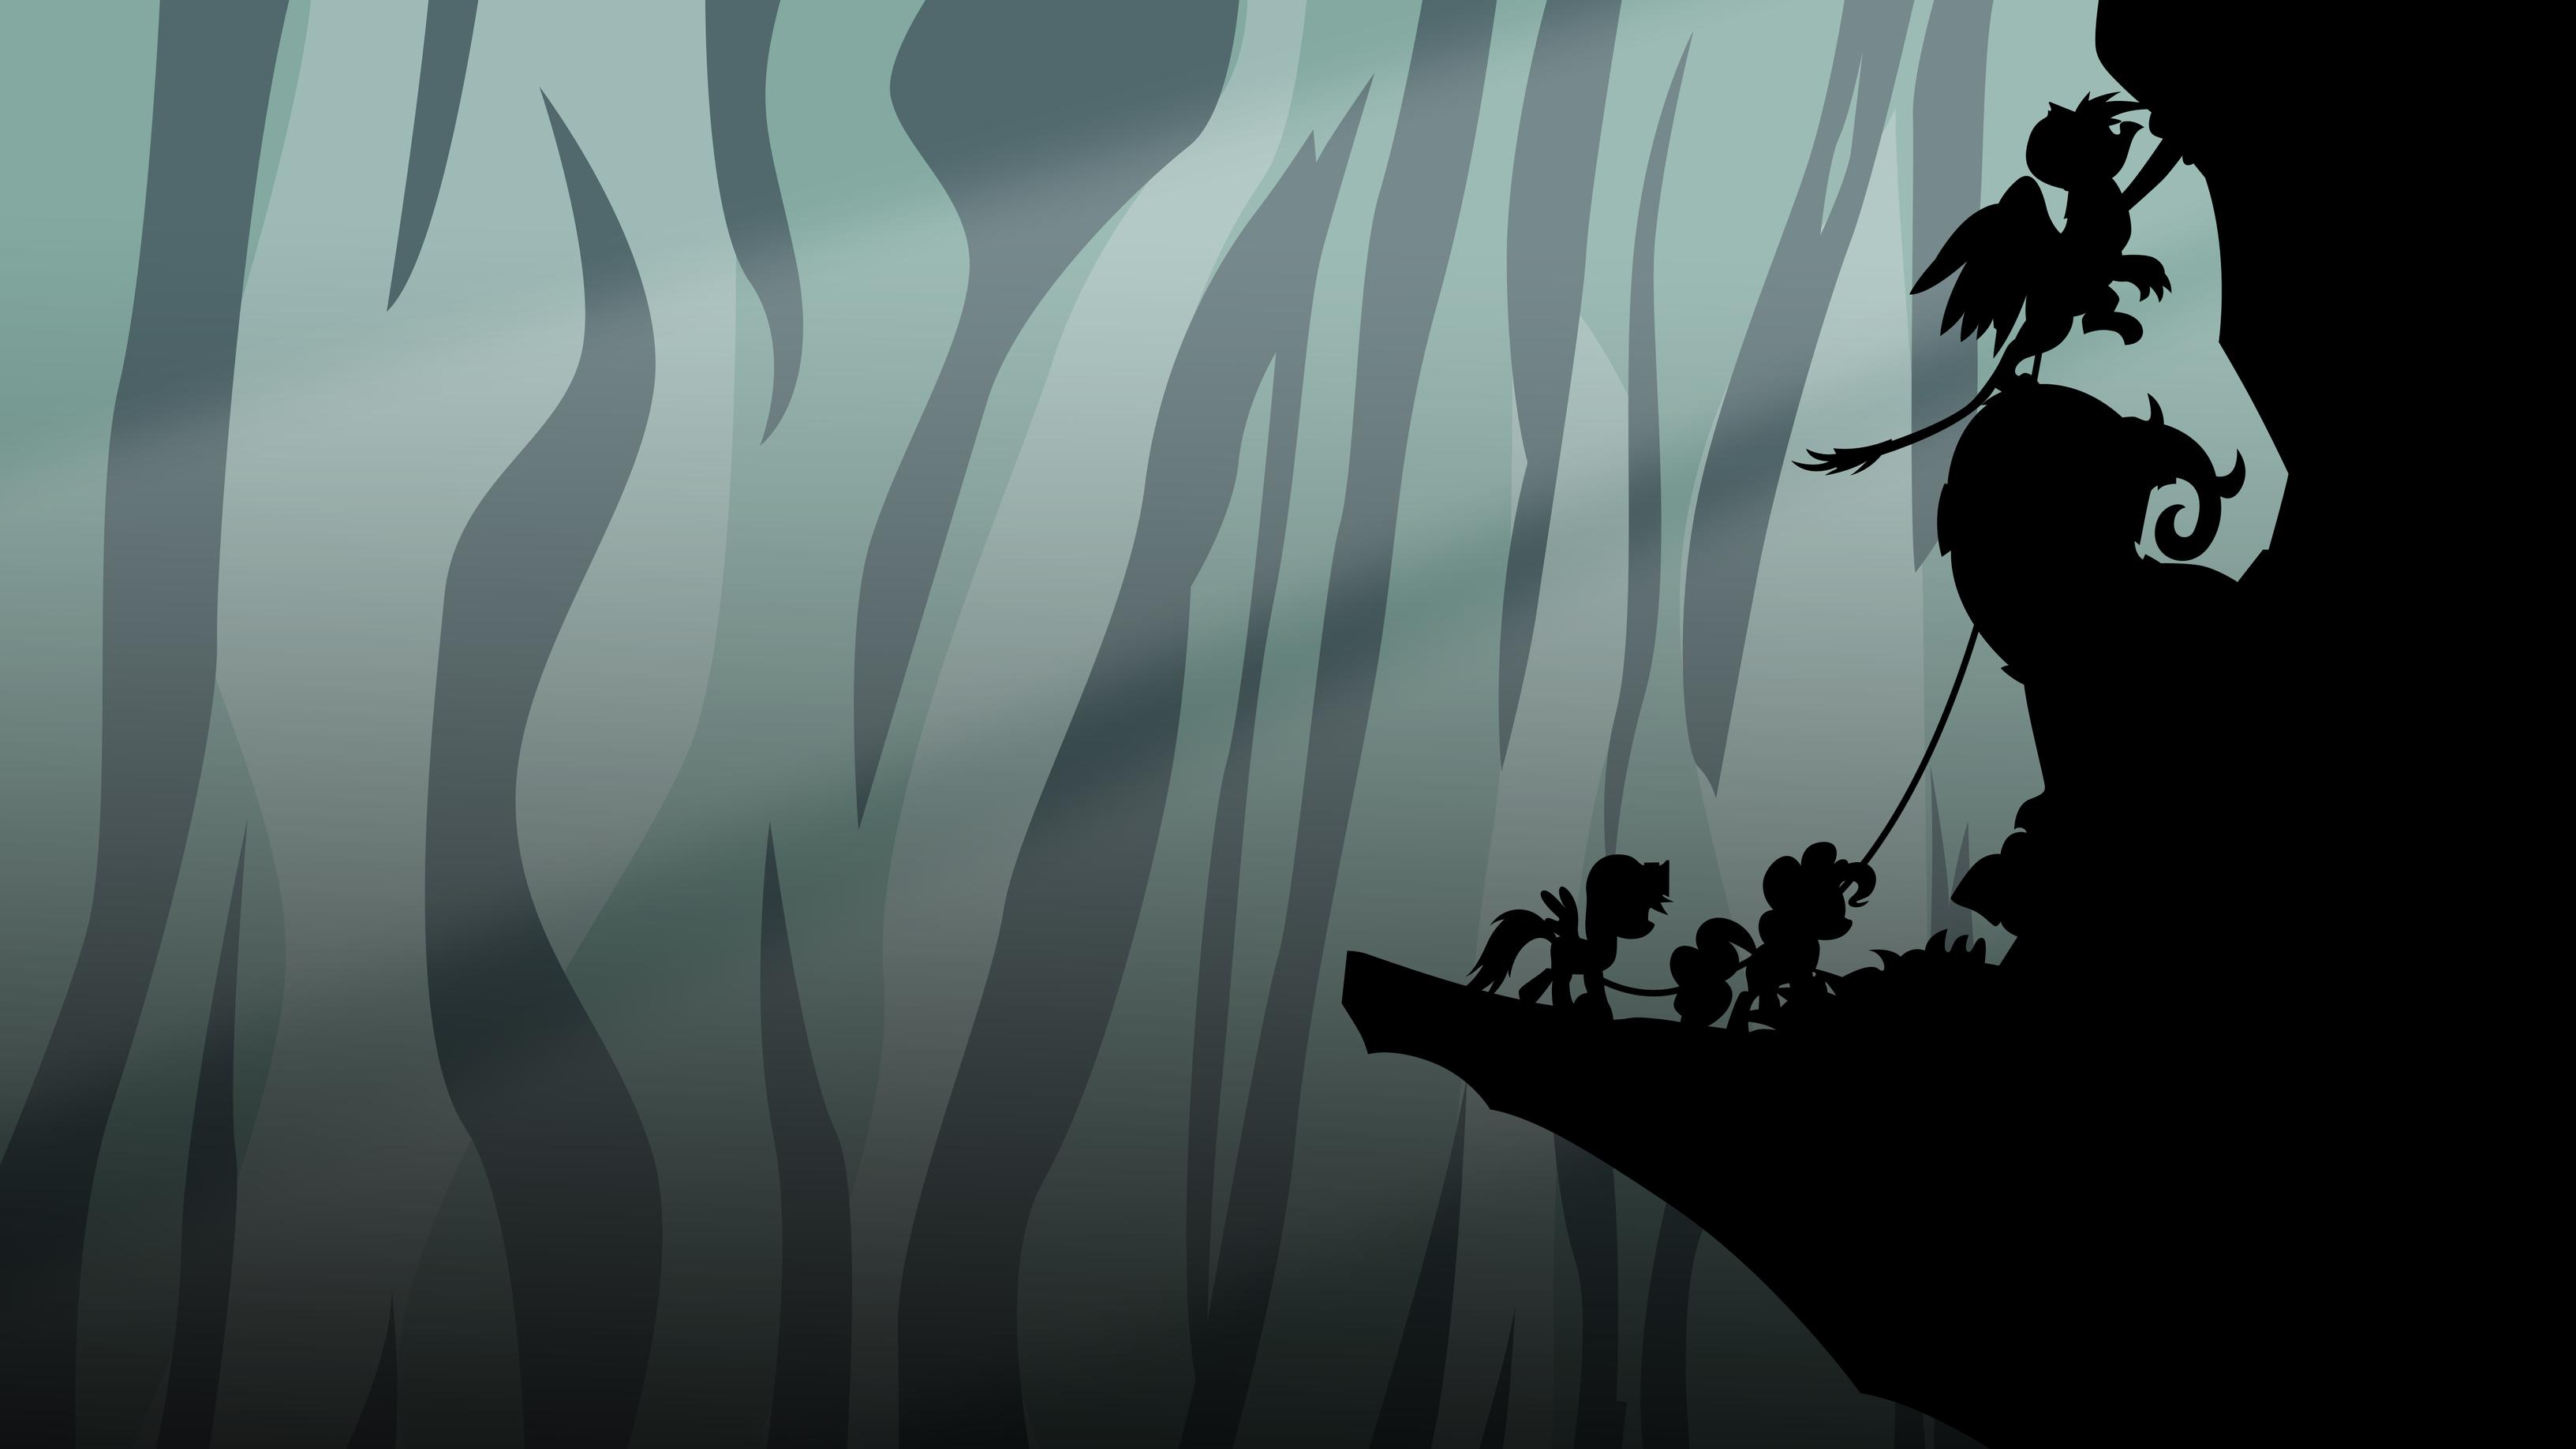 Silhouette Adventure by Kooner-cz